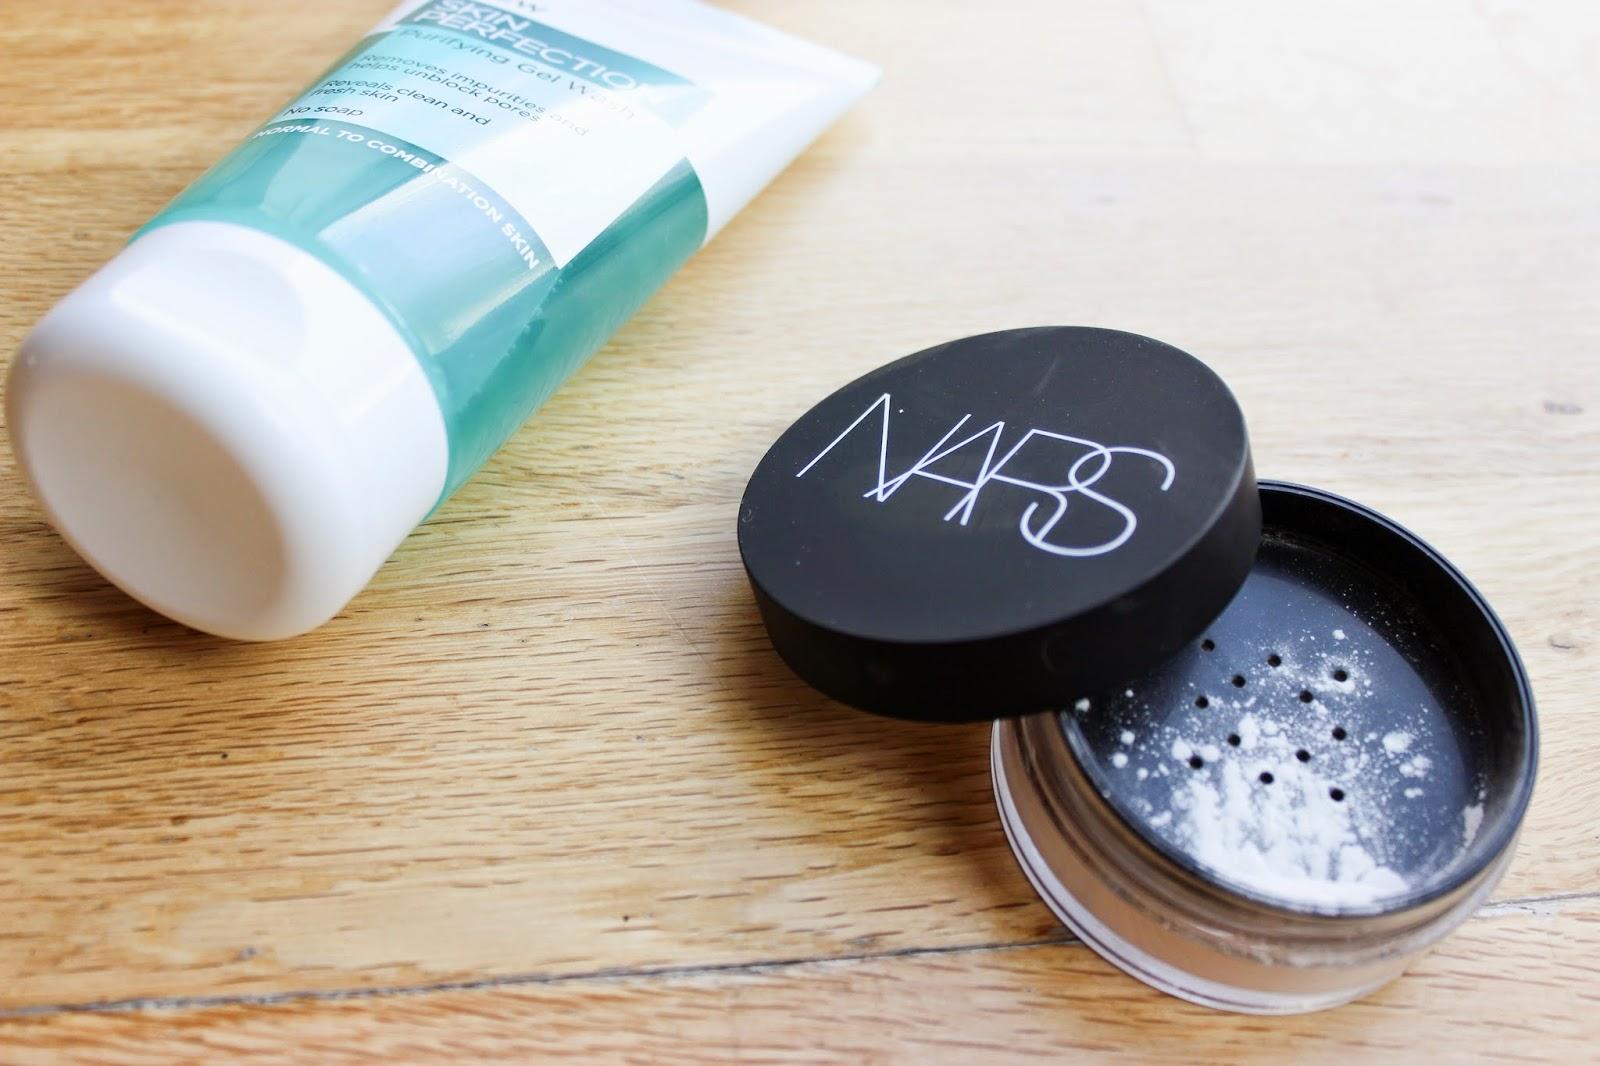 Savoo Natural Makeup NARS Lighting Powder Hourglass Ambient Powder Beauty Blogger